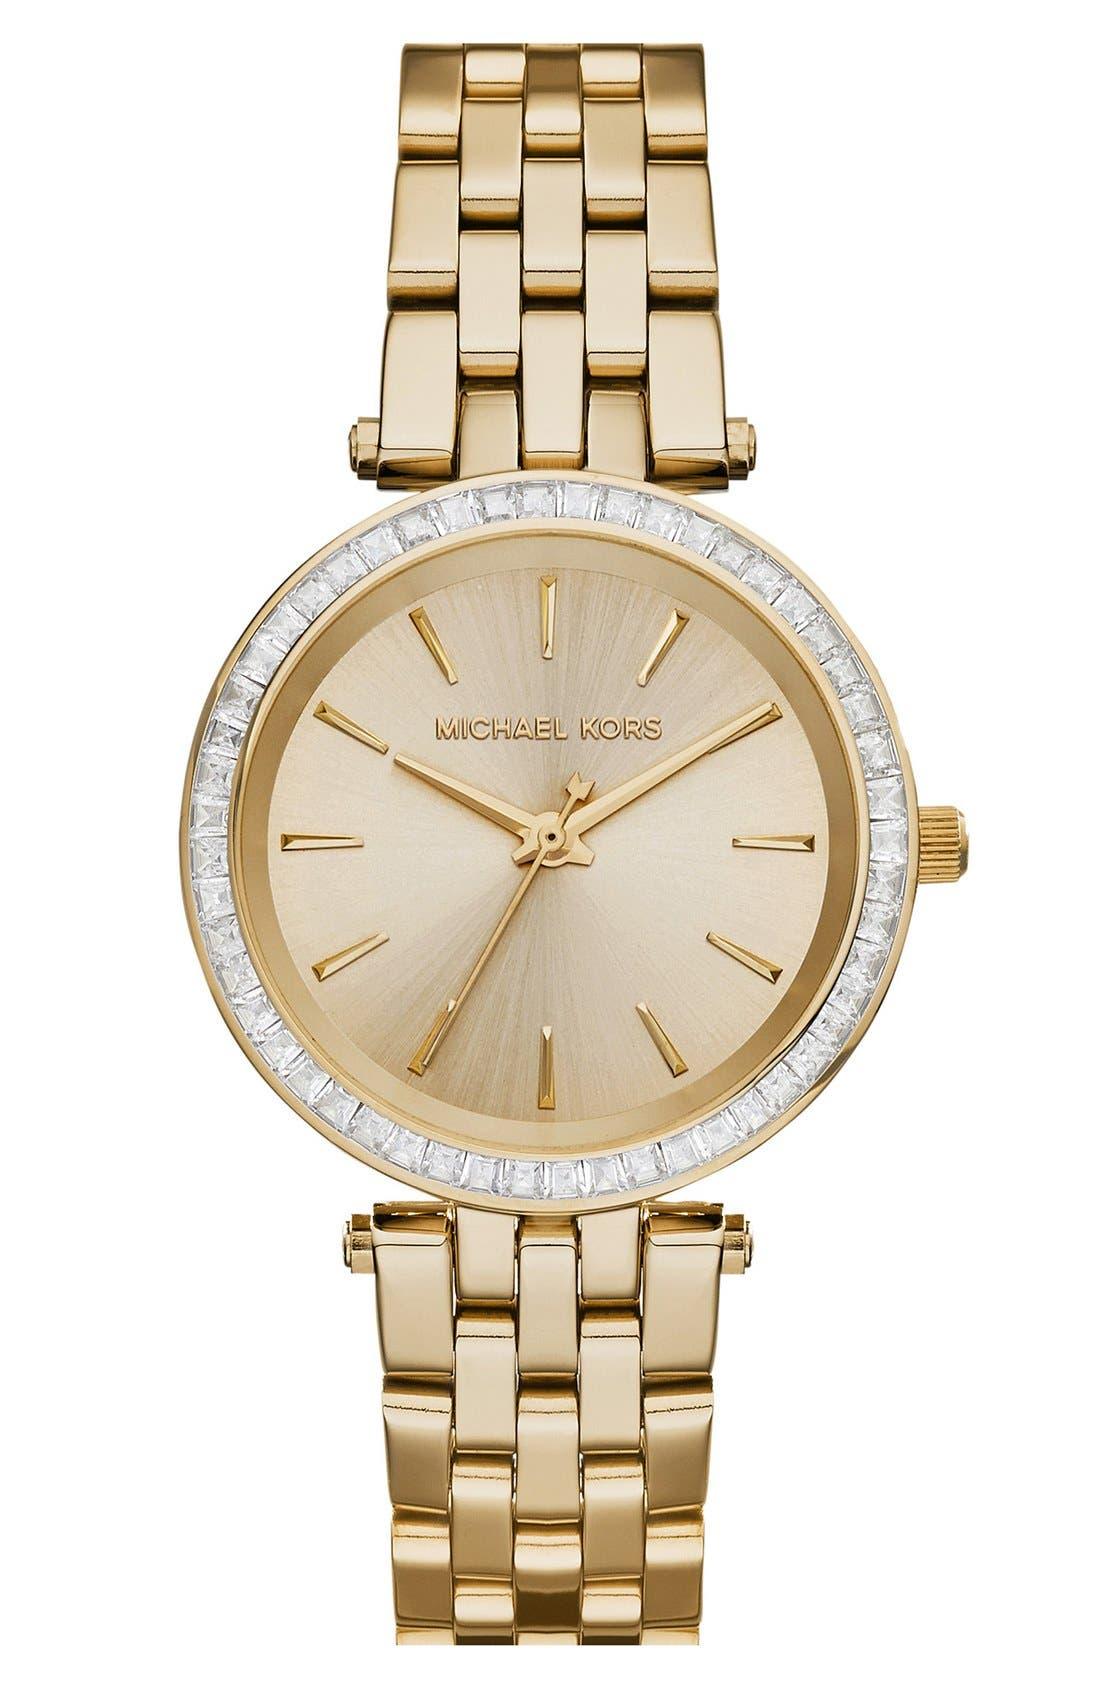 Michael Kors 'Mini Darci' Round Bracelet Watch, 33mm